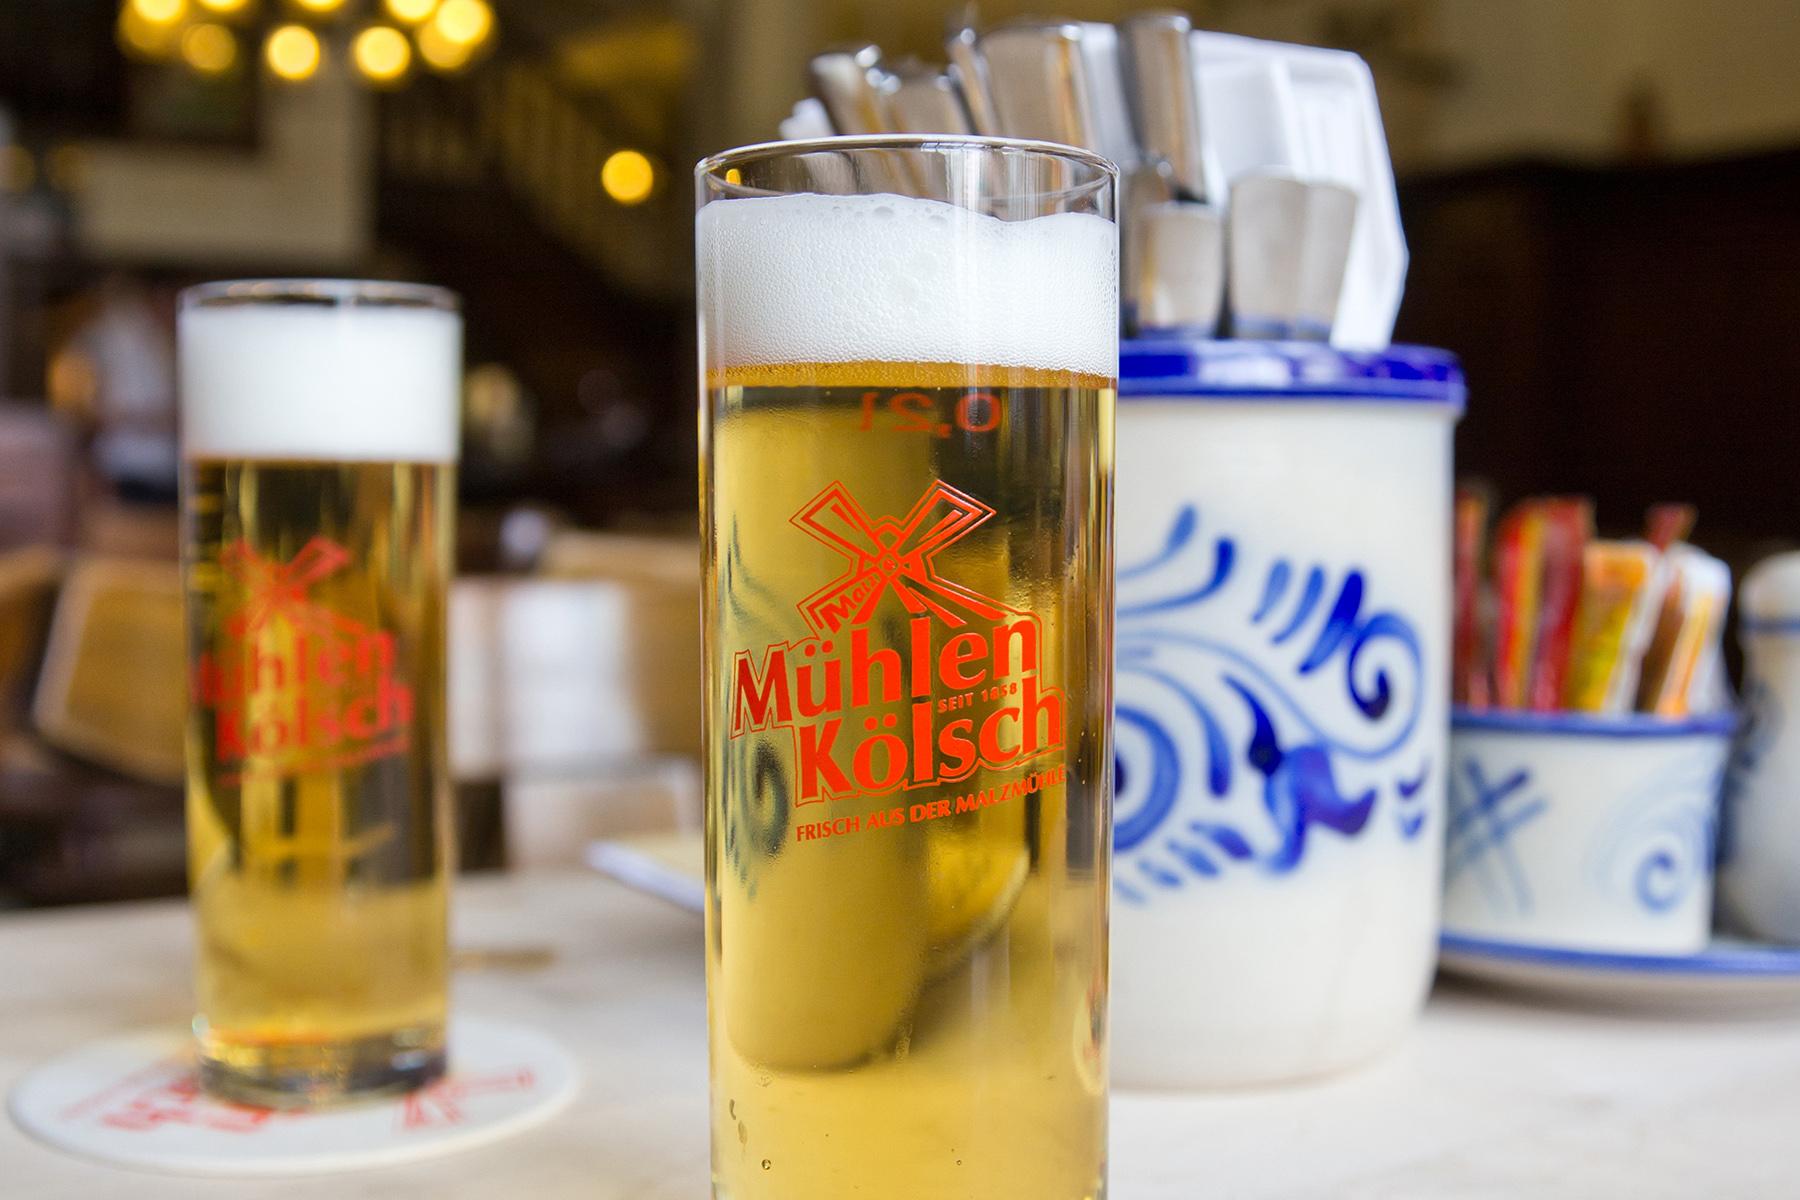 Two glasses of Kölsch from Brauerei zur Malzmühle in Cologne